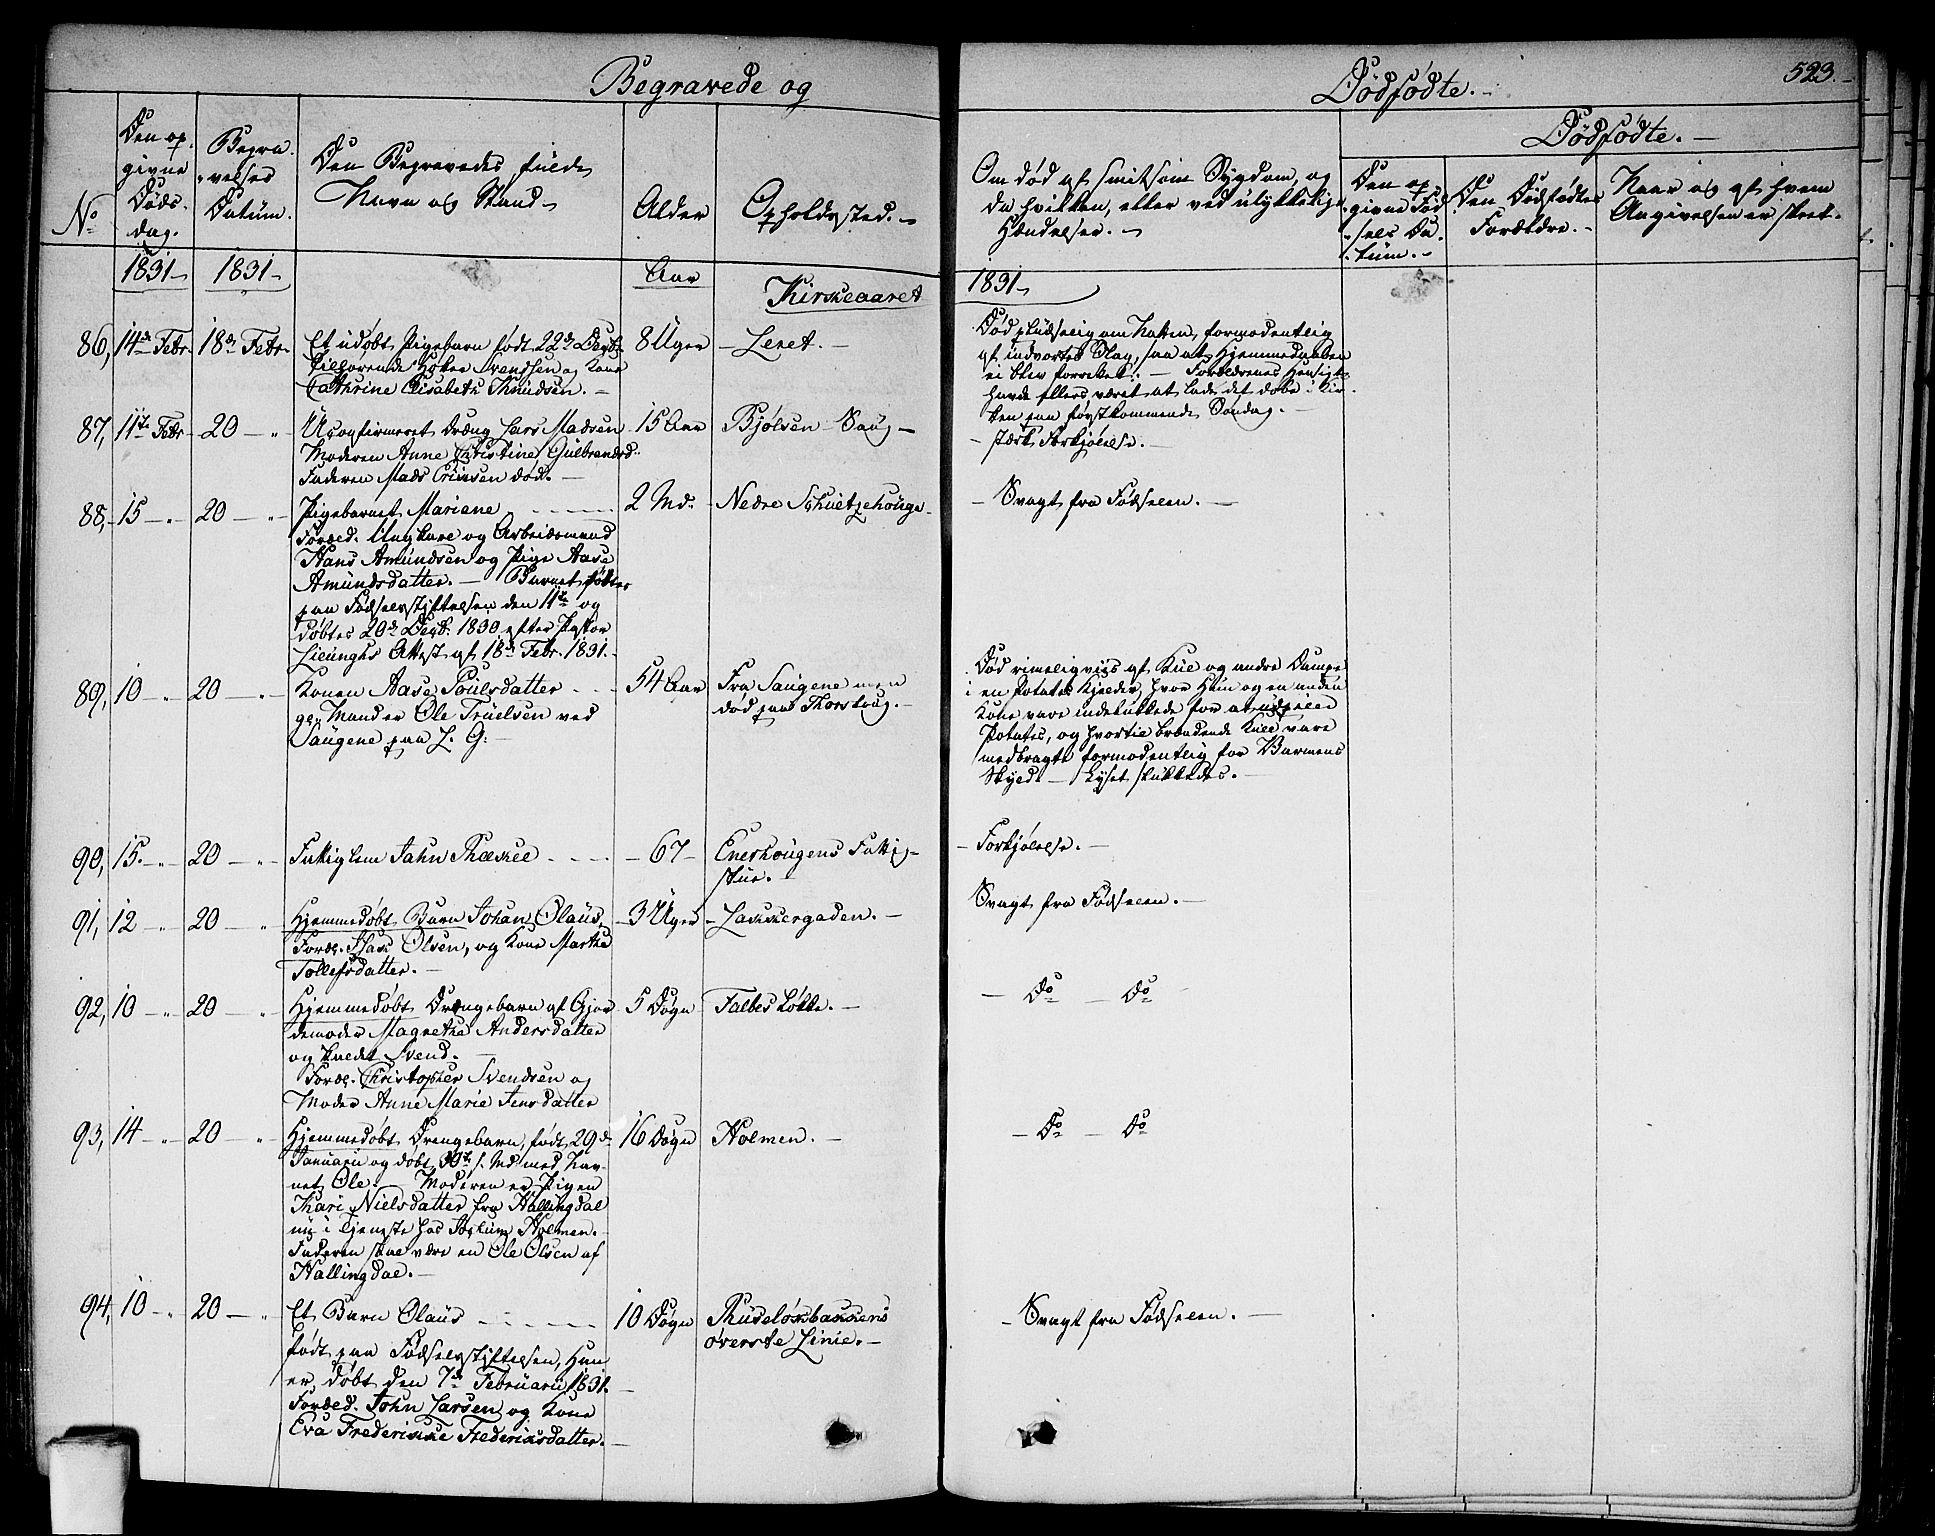 SAO, Aker prestekontor kirkebøker, F/L0013: Parish register (official) no. 13, 1828-1837, p. 523